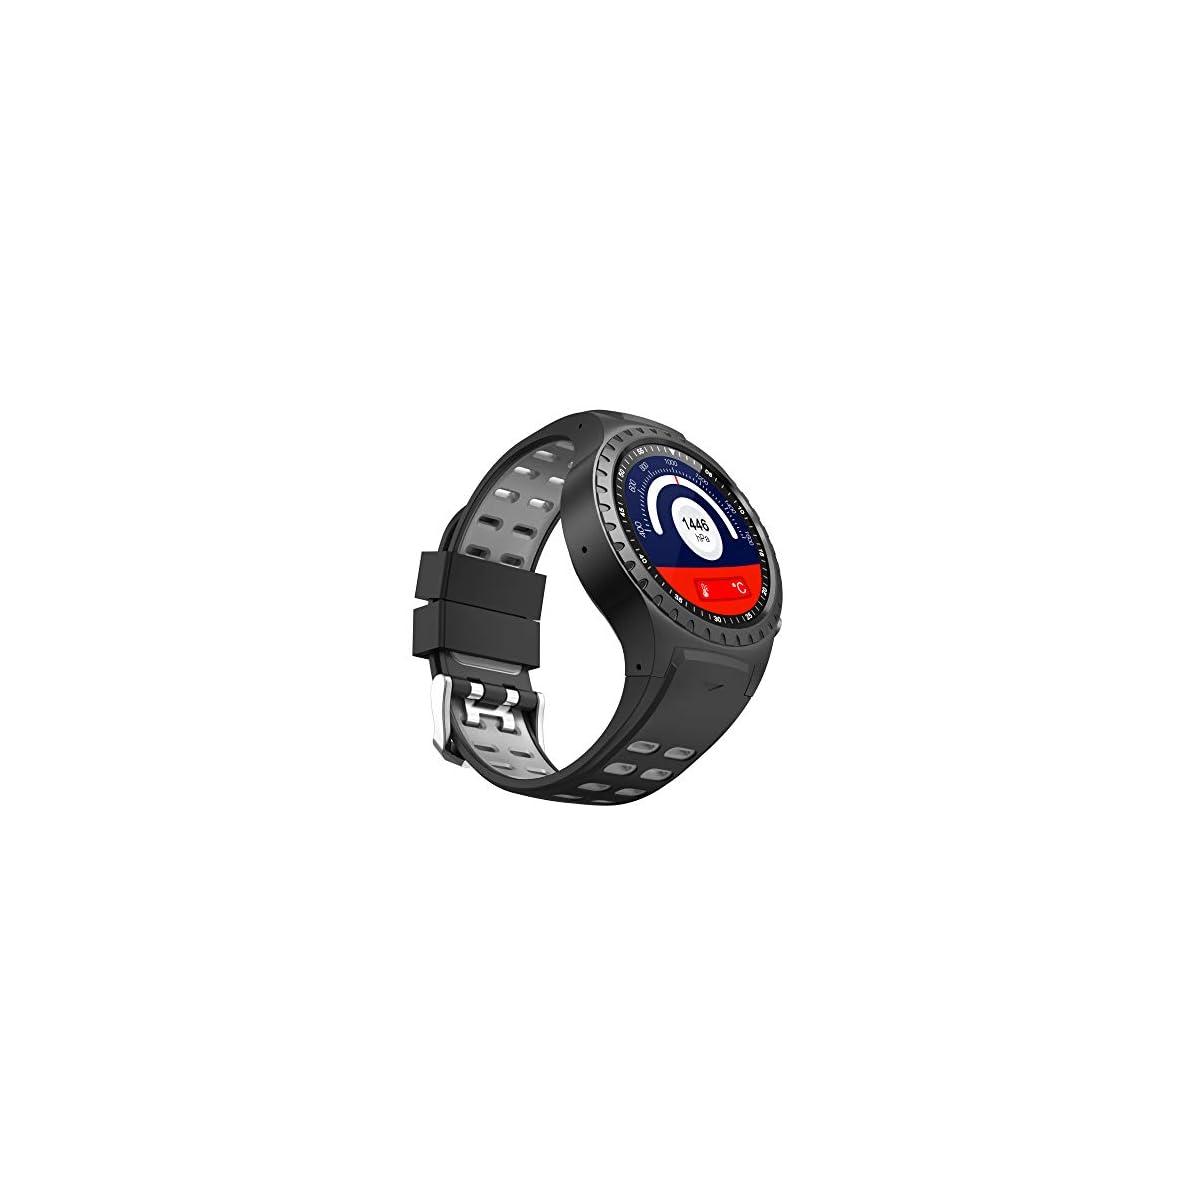 41PZ0f%2Bd%2B8L. SS1200  - PRIXTON - Reloj Inteligente Hombre/Mujer-Reloj Smartwatch Hombre/Mujer: GPS, SIM, Pulsómetro   SW36